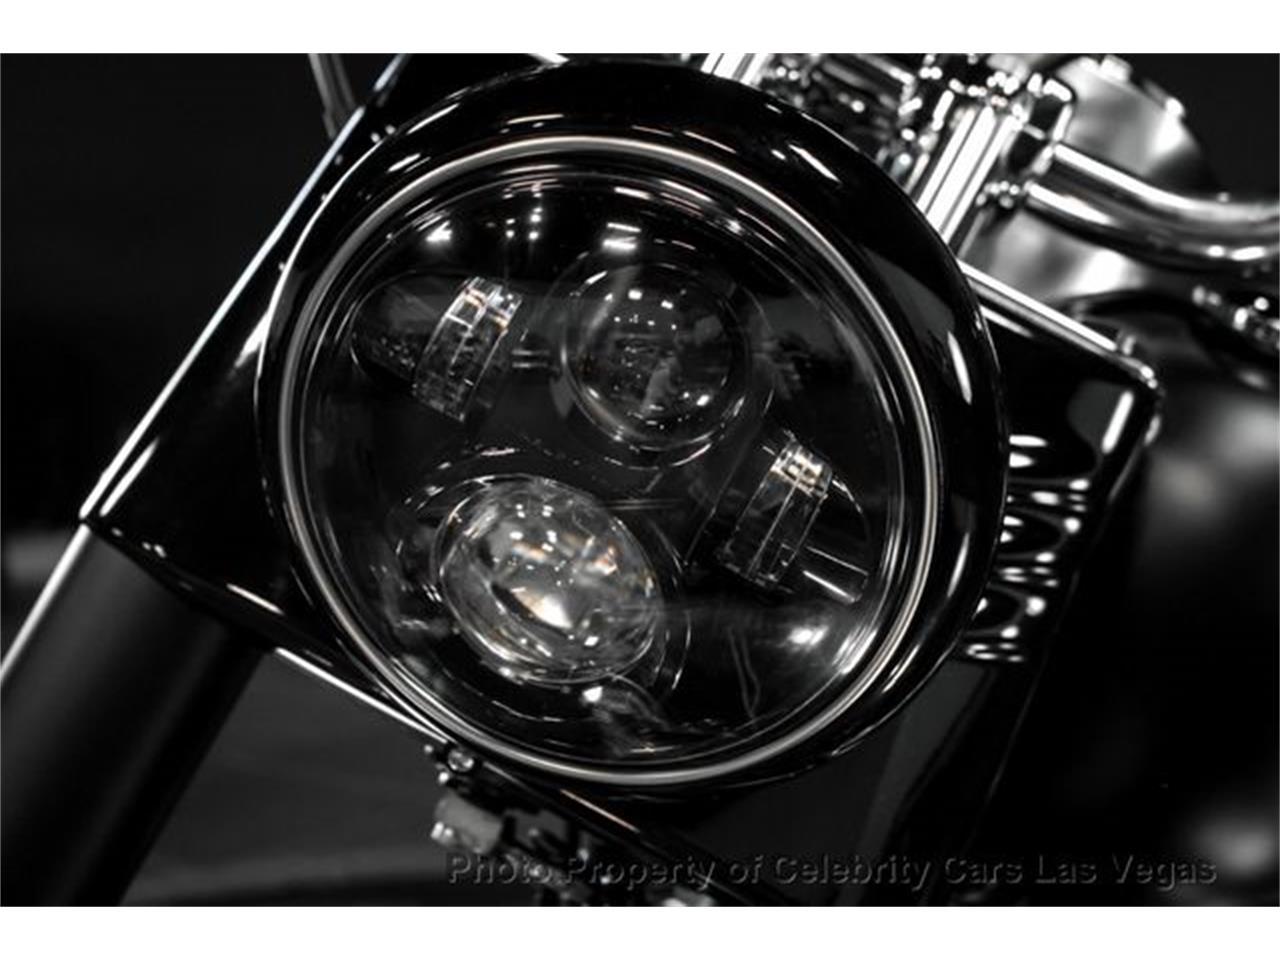 2013 Harley-Davidson Motorcycle (CC-1015564) for sale in Las Vegas, Nevada